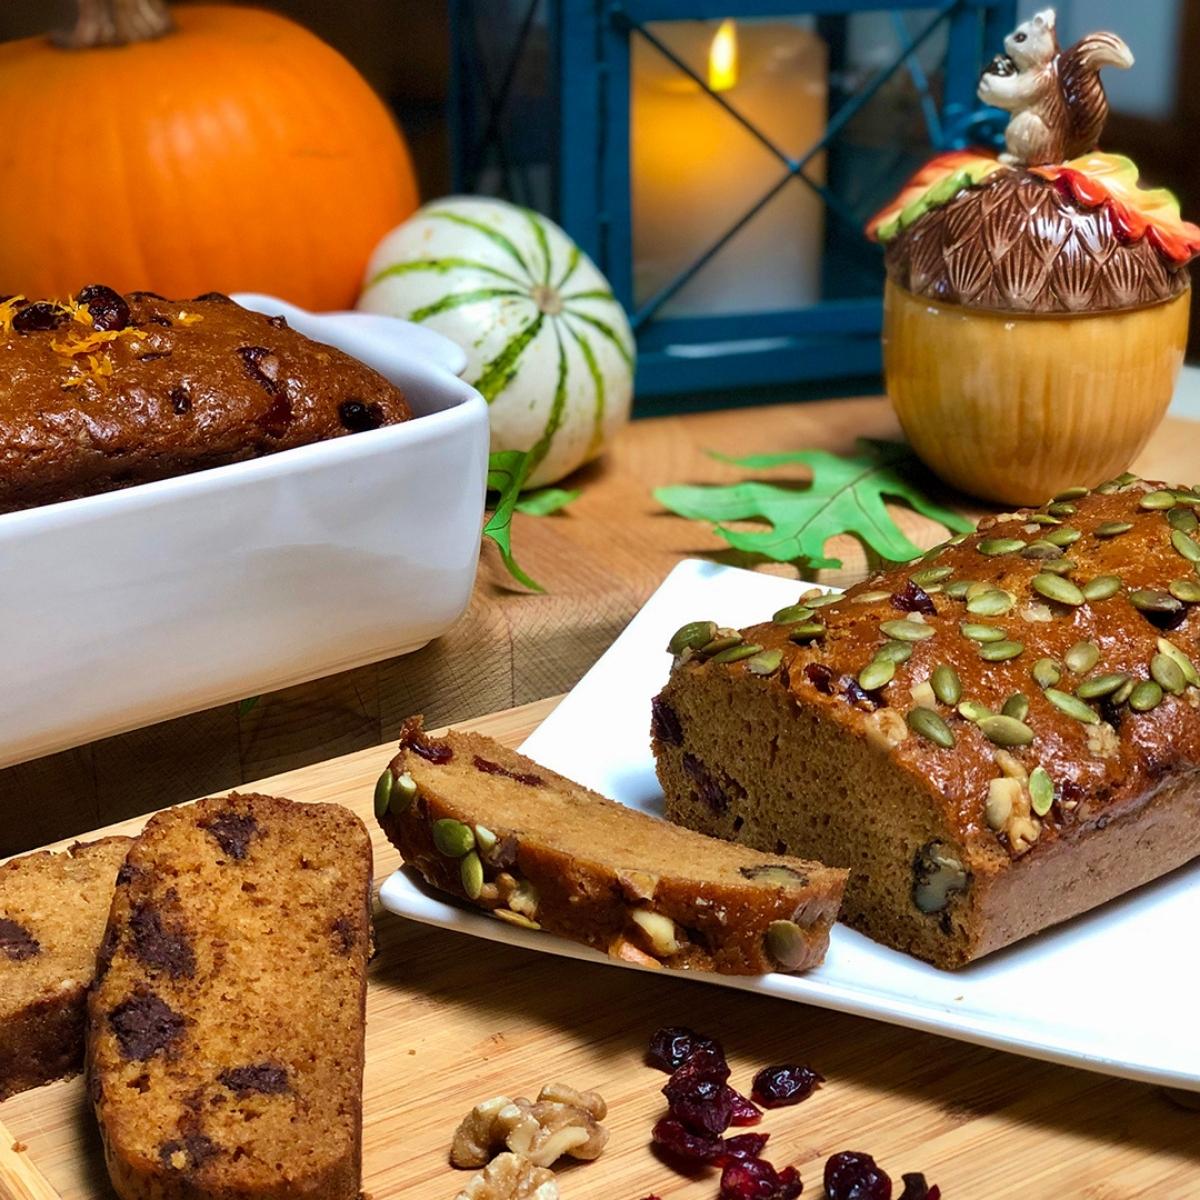 Loaves of vegan pumpkin bread arranged in a fall-themed setting.